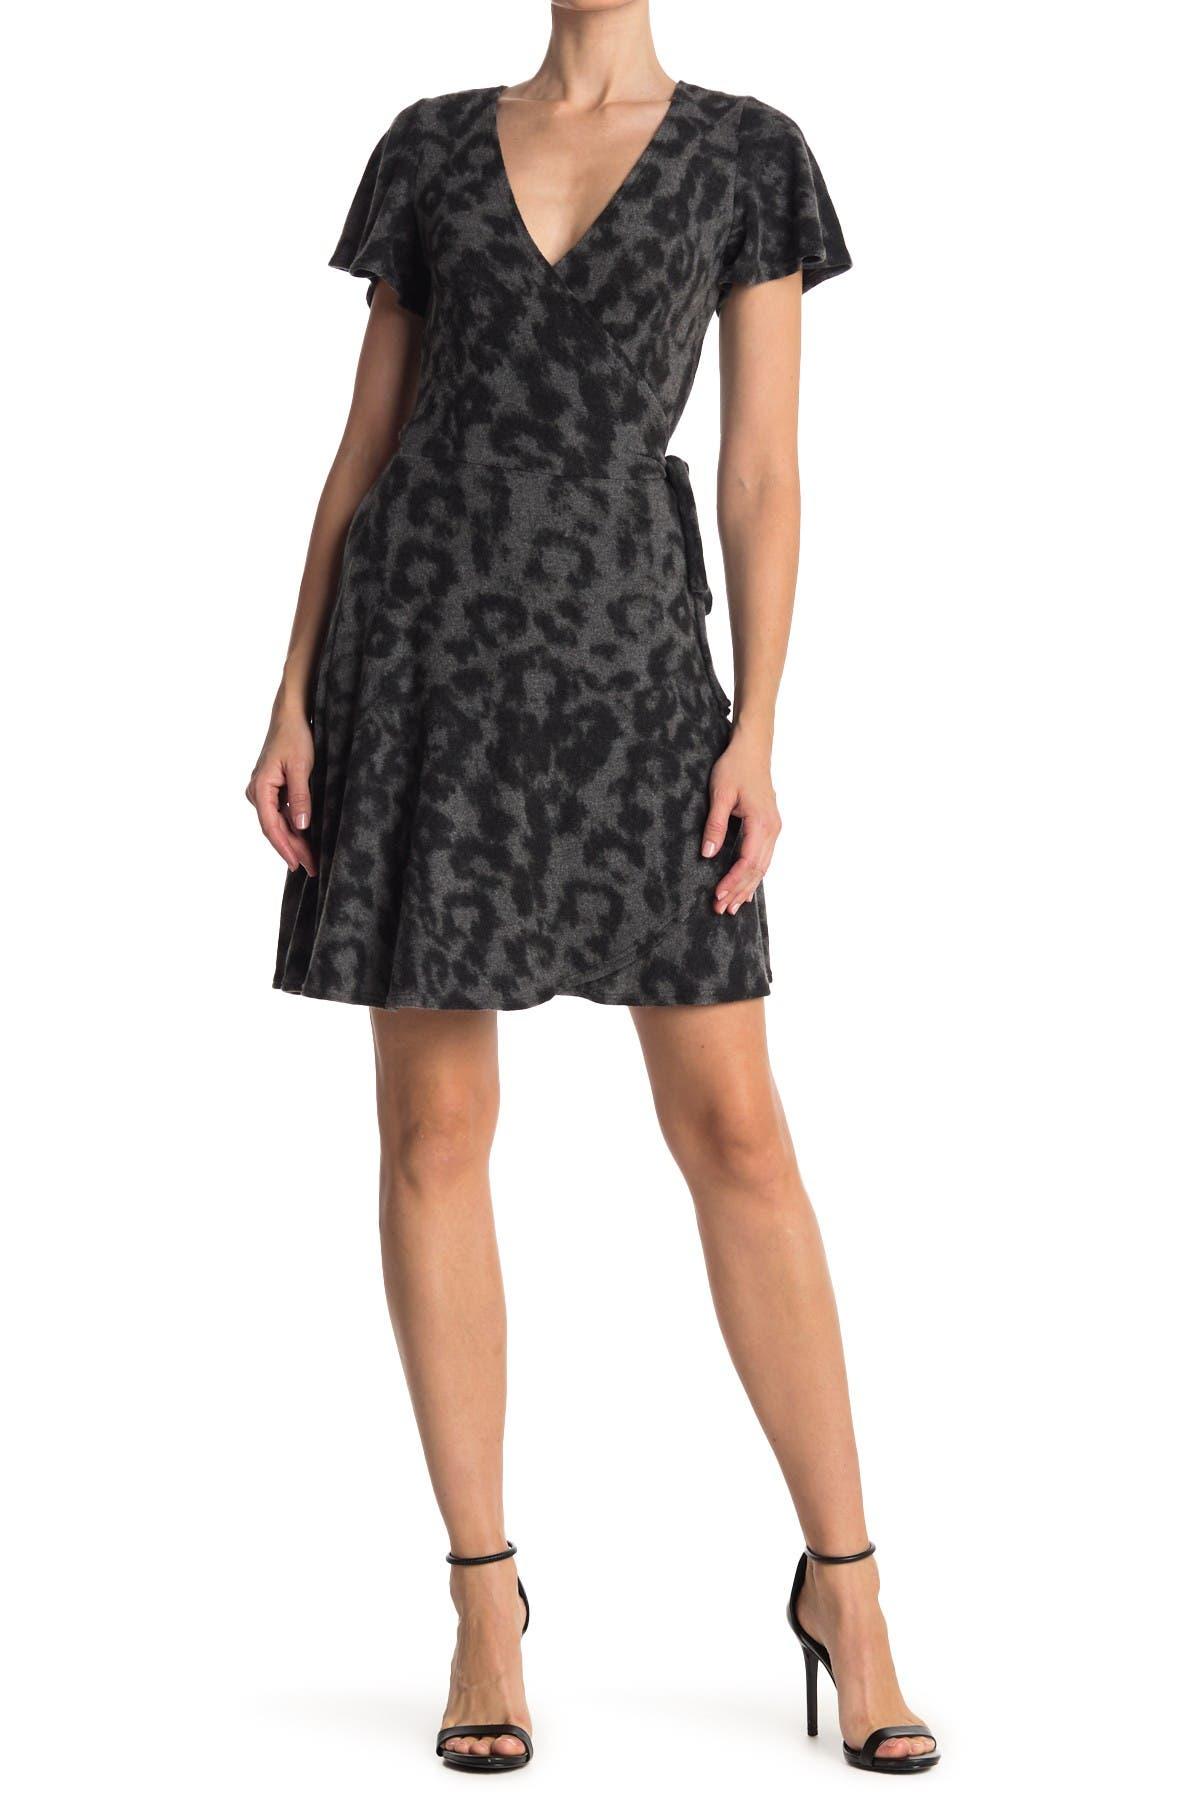 Image of Vanity Room Short Sleeve Faux Wrap Knit Dress